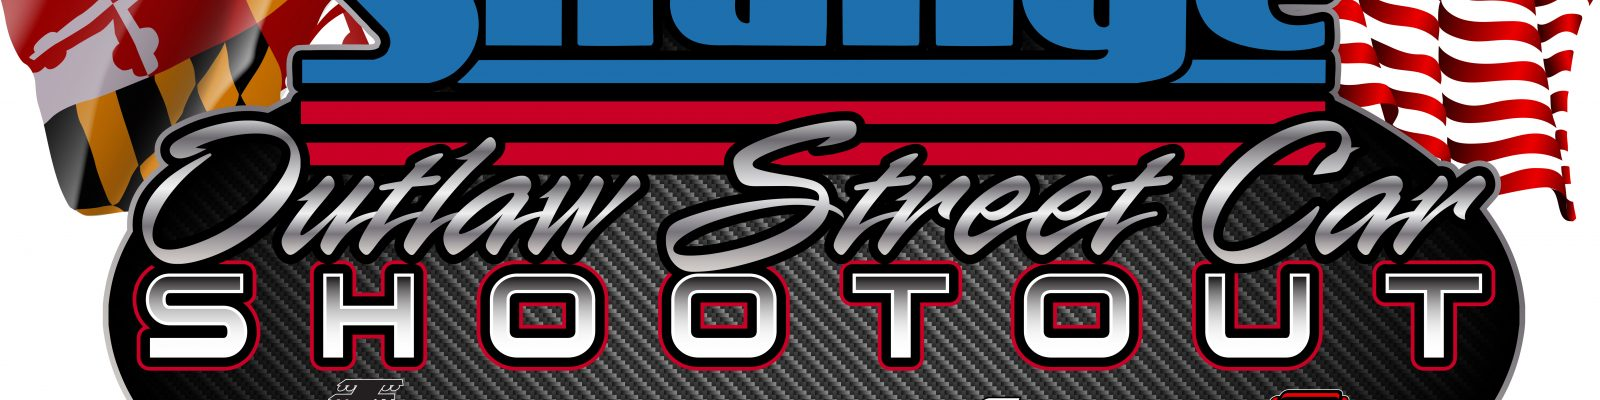 Cecil County Street Car Shootout sticker